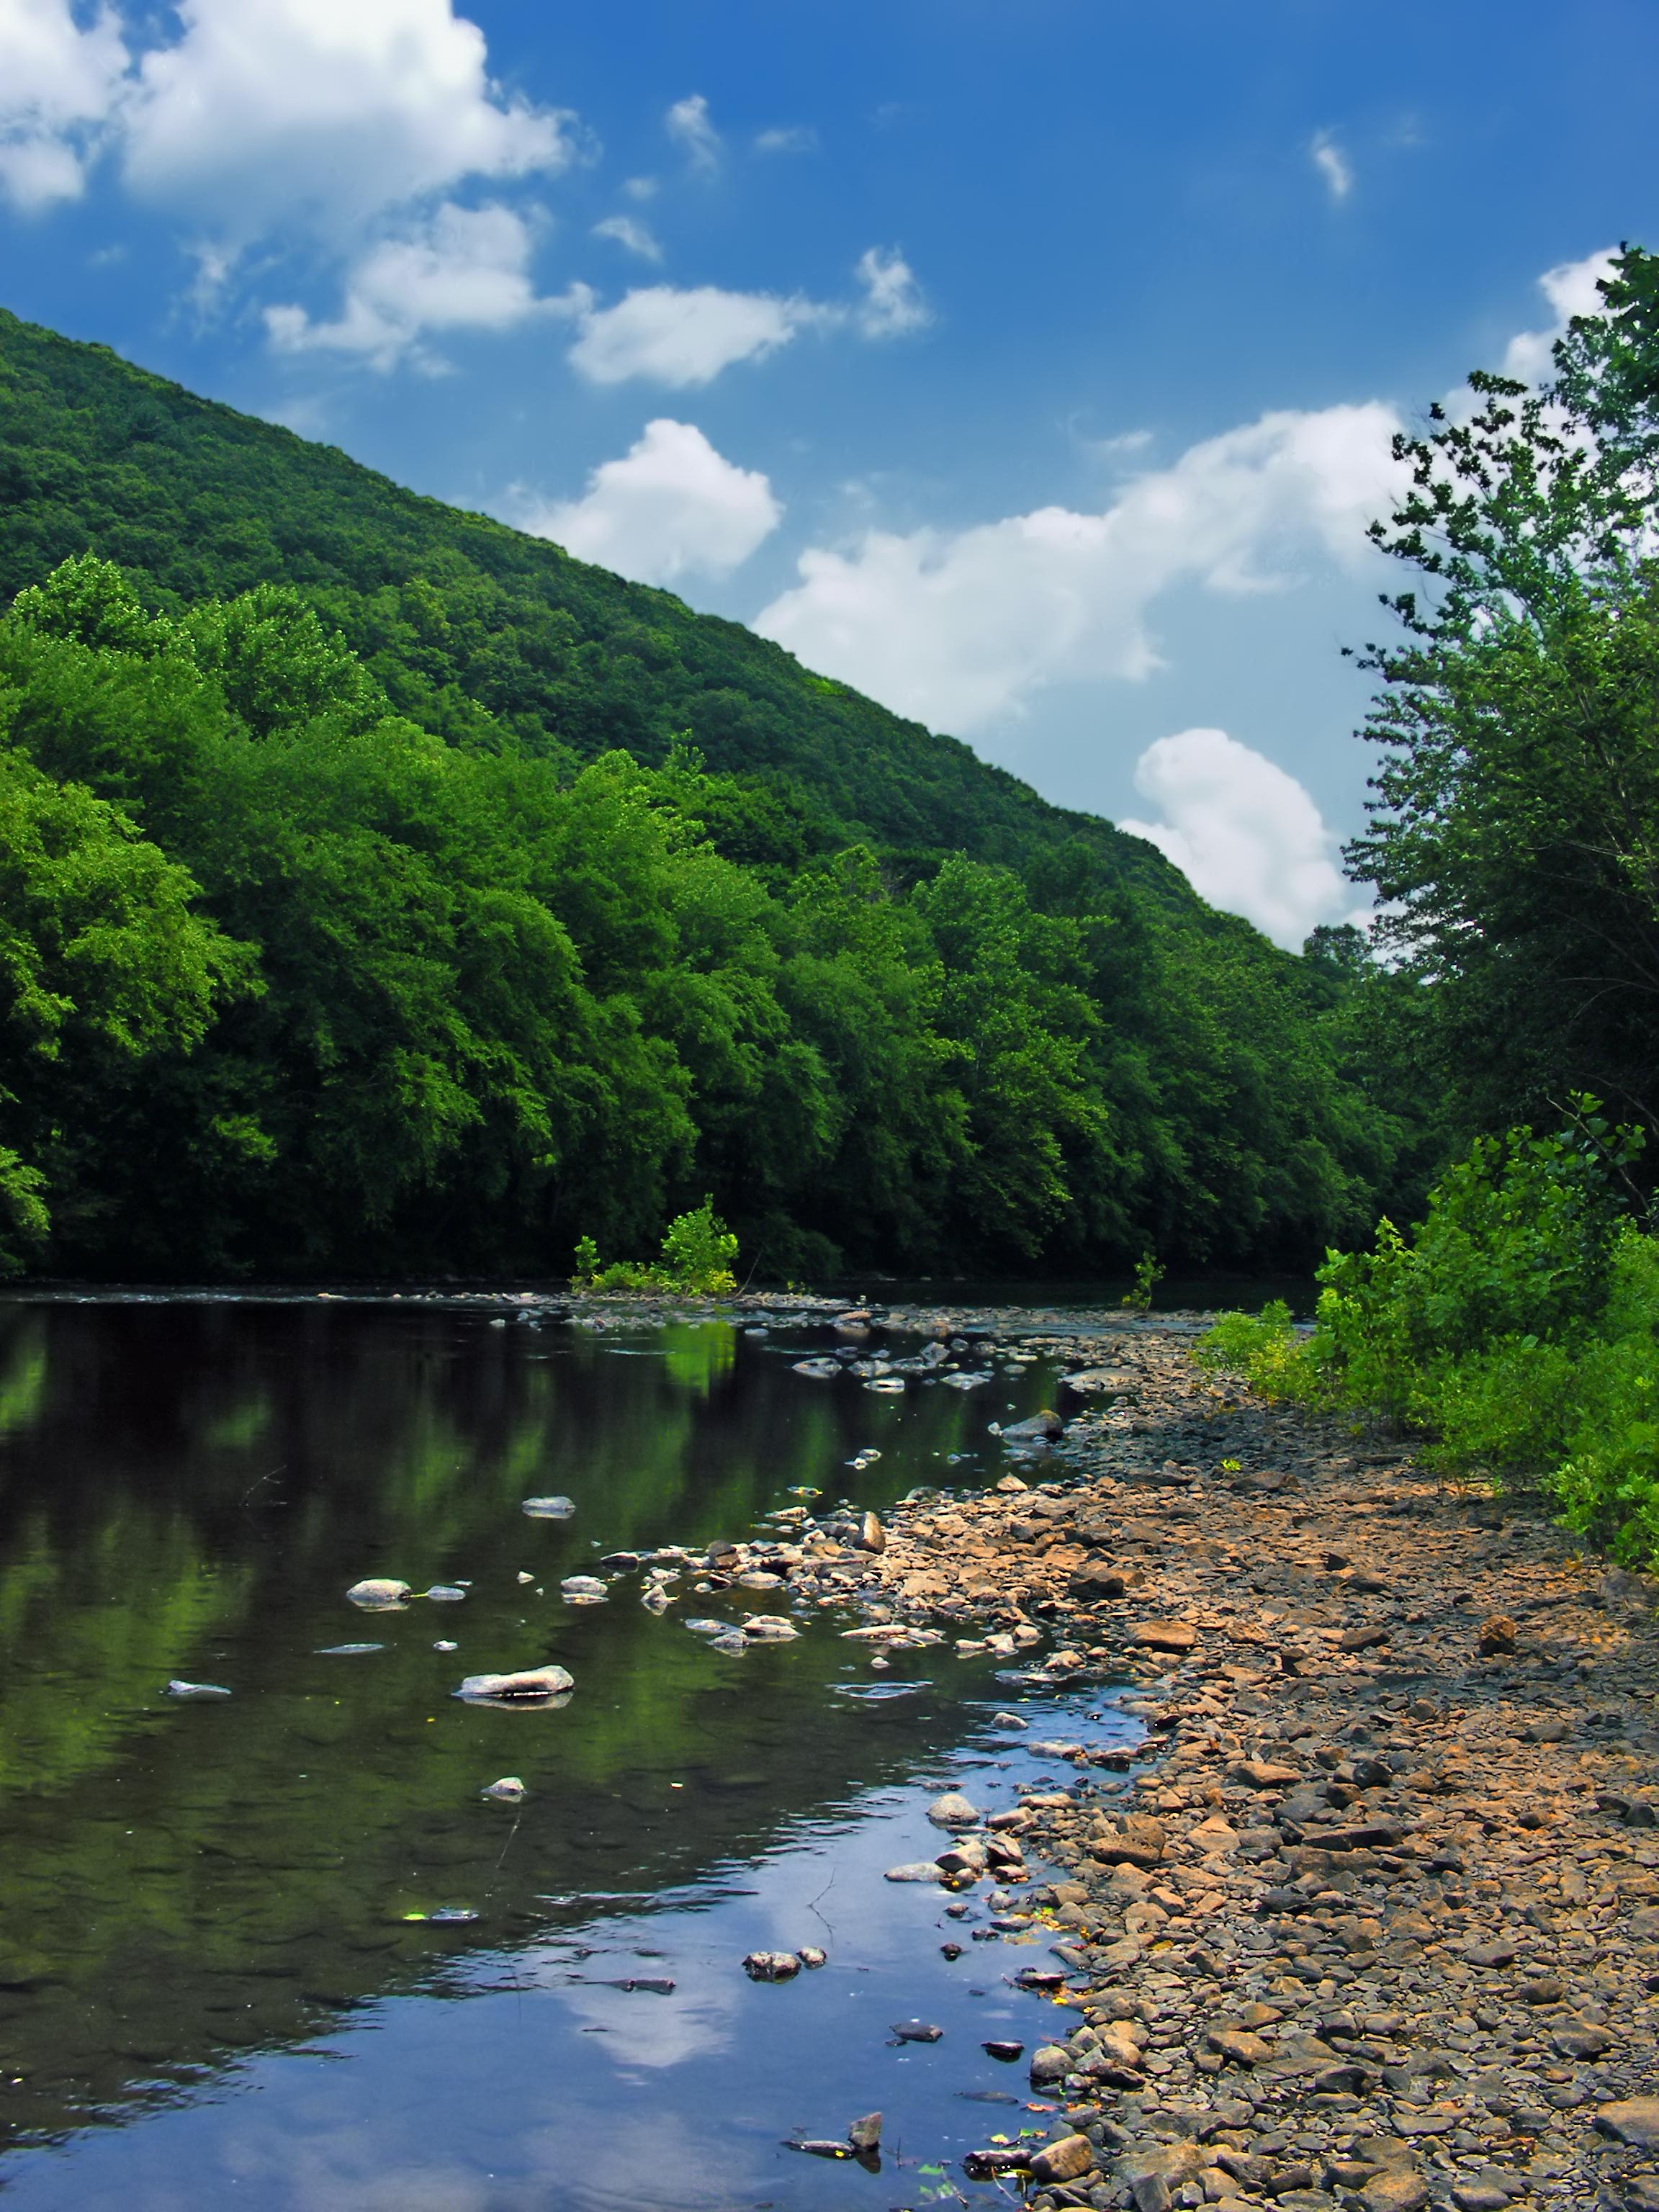 File:Schuylkill River Shallow.jpg - Wikimedia Commons